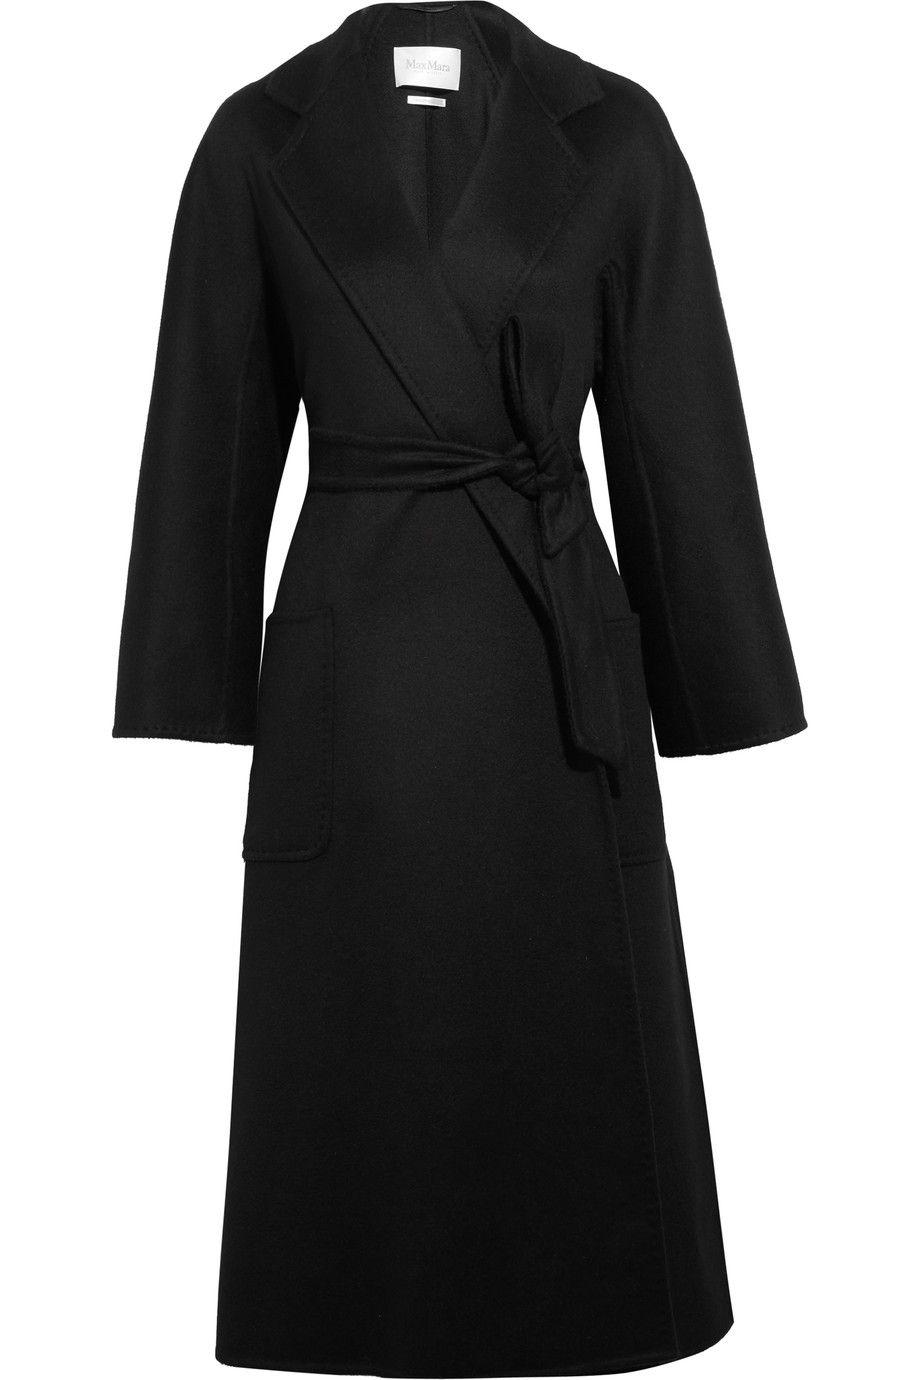 Max Mara Labro oversized cashmere coat NETAPORTER